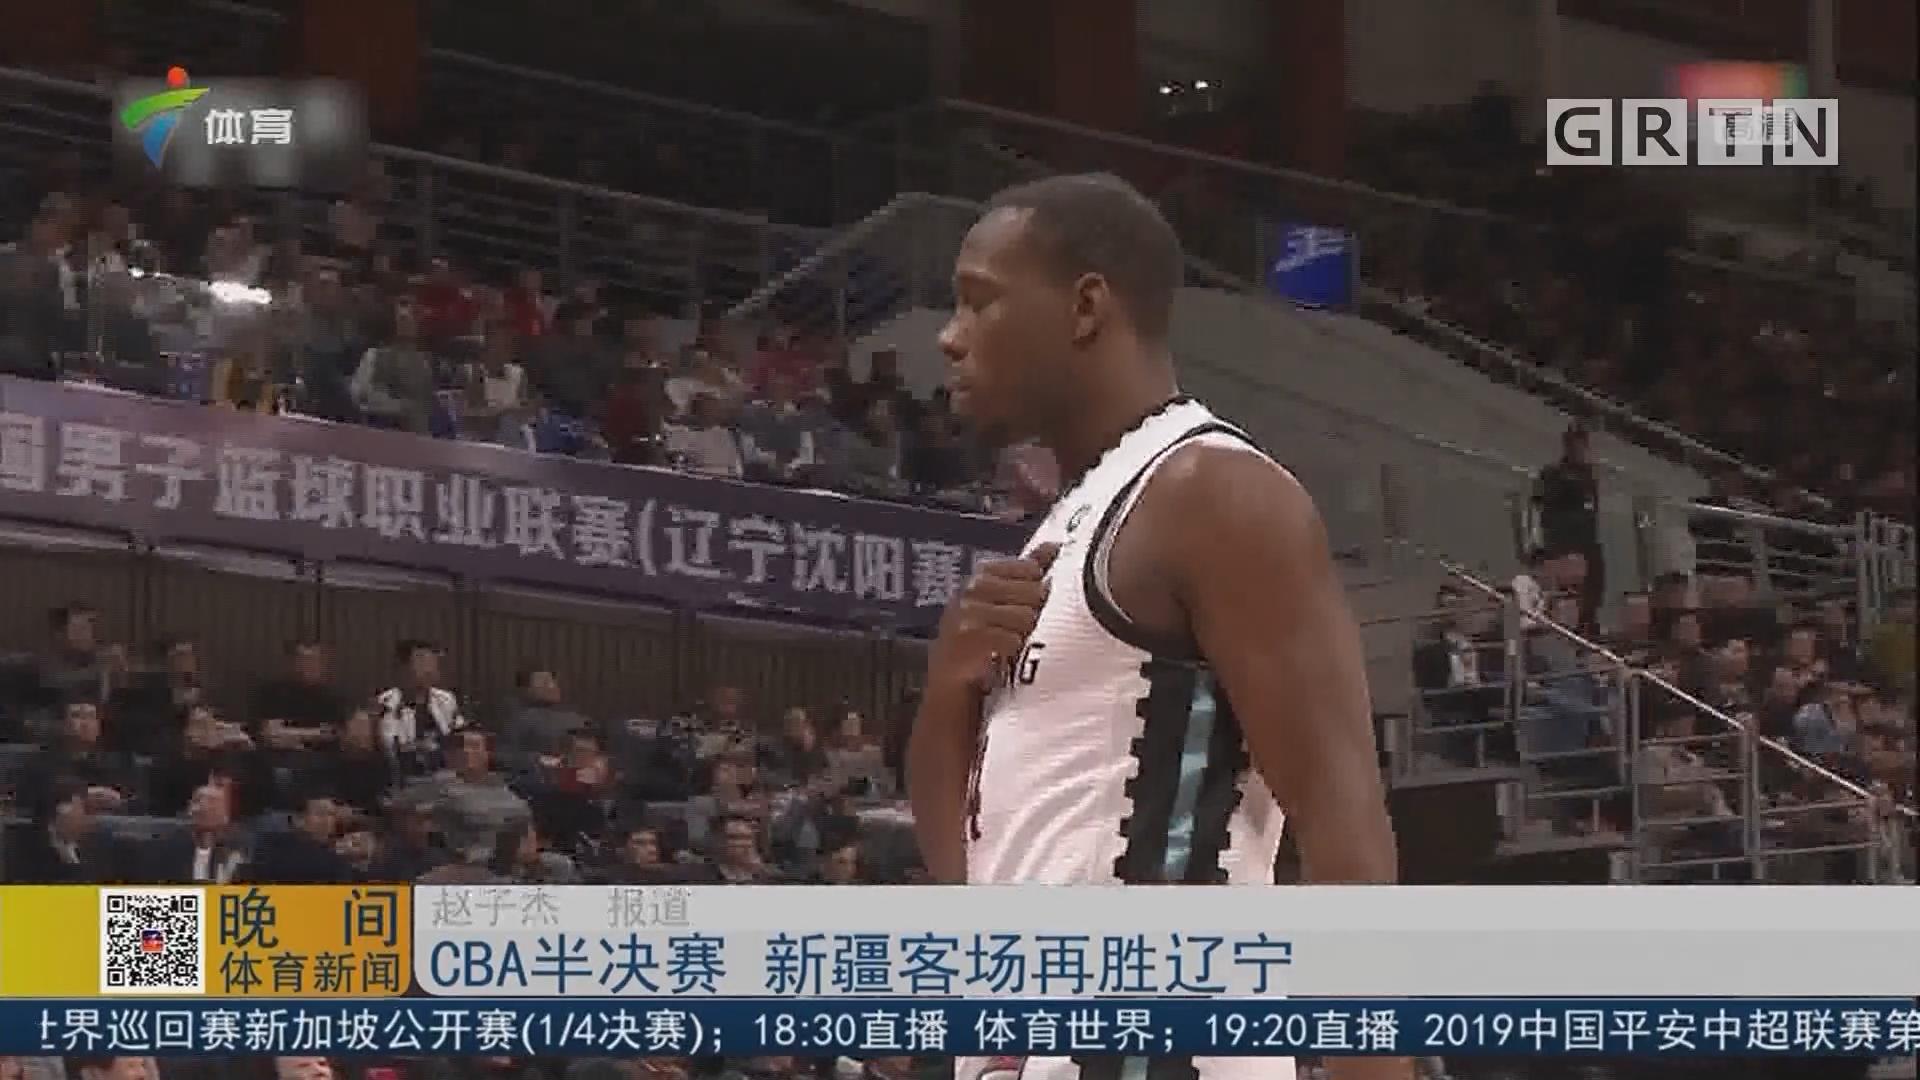 CBA半决赛 新疆客场再胜辽宁